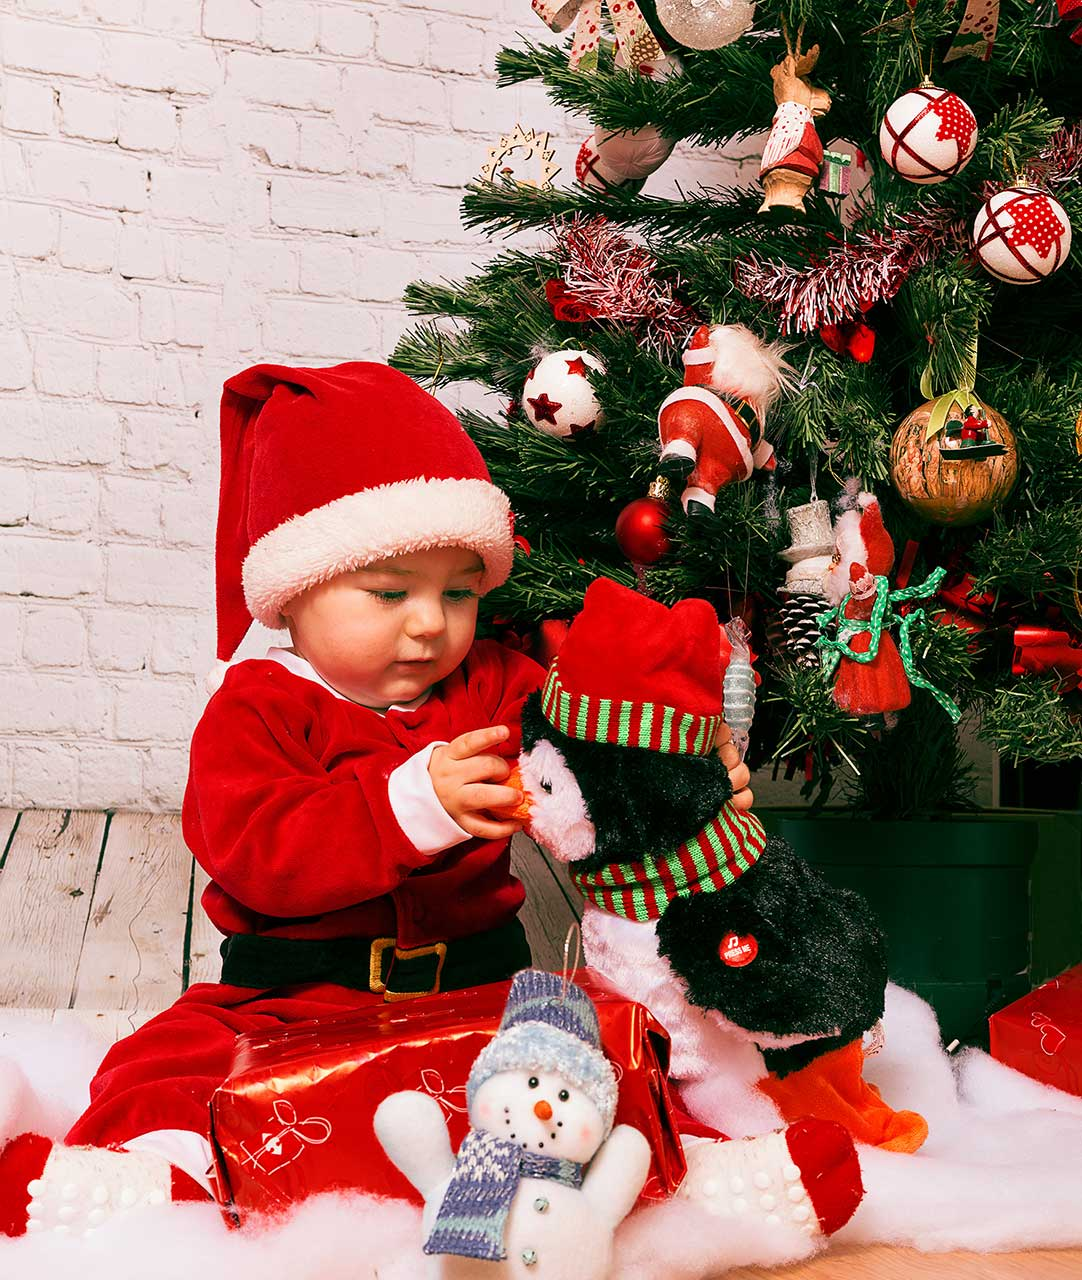 https://www.kidsphotography.es/wp-content/uploads/2021/04/Sesiones-Navidad-Ixeia-0606-©-Kids-Photography.jpg